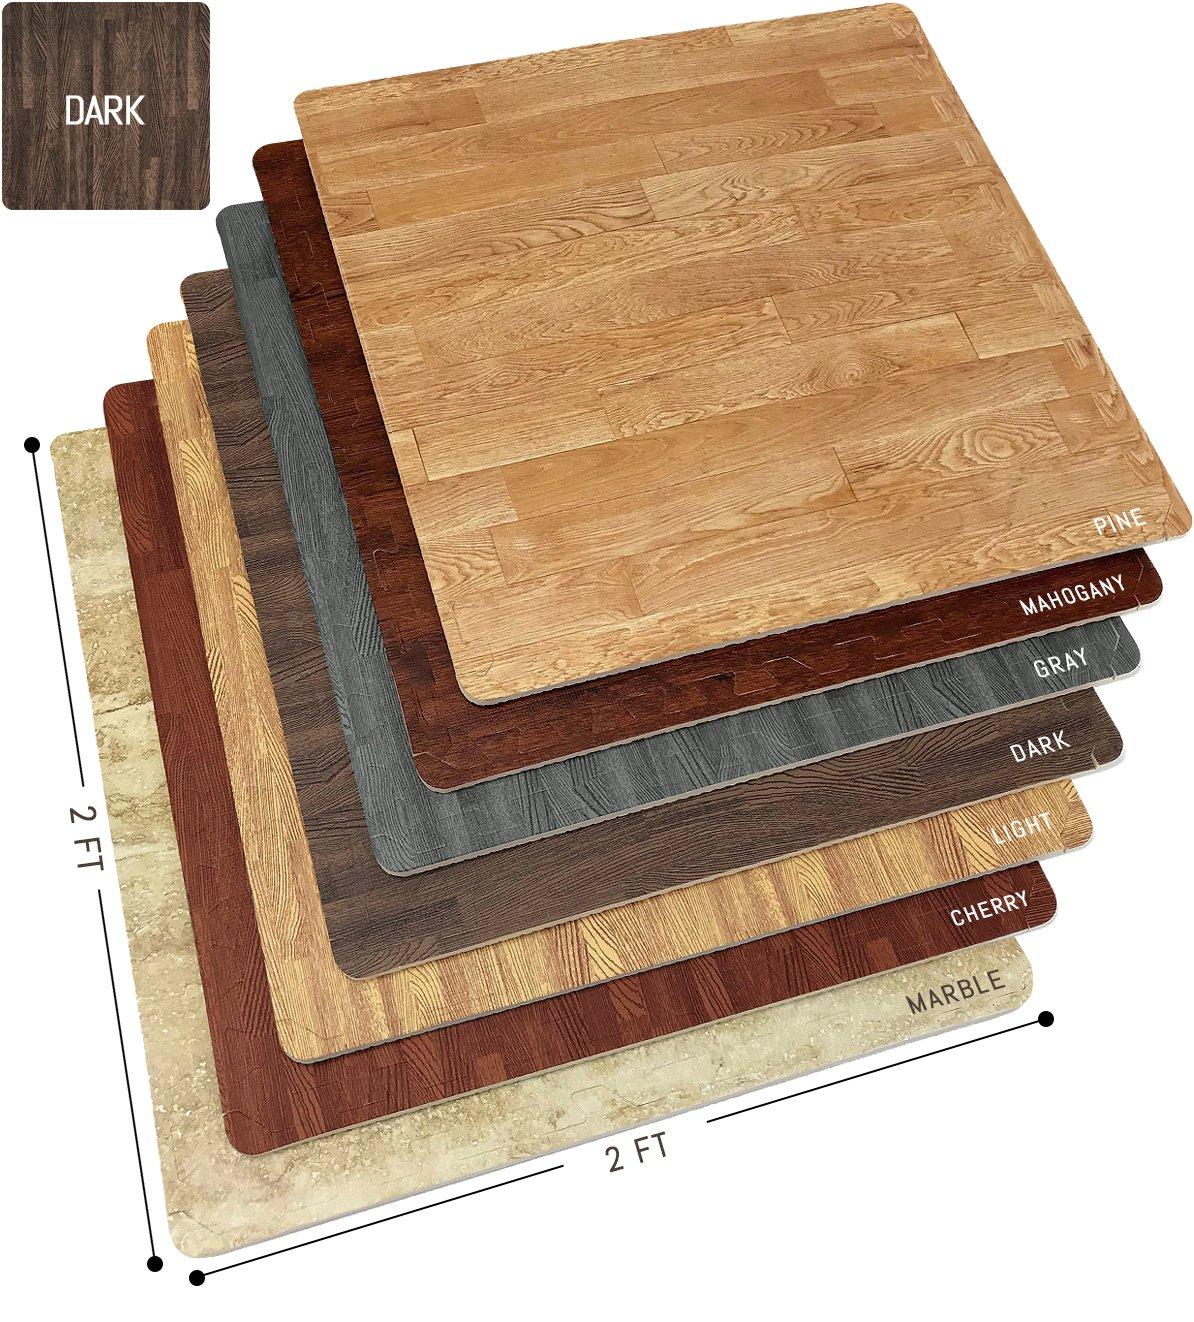 Sorbus Interlocking Floor Mat Print, Wood Grain - Dark (6-Piece) by Sorbus (Image #1)